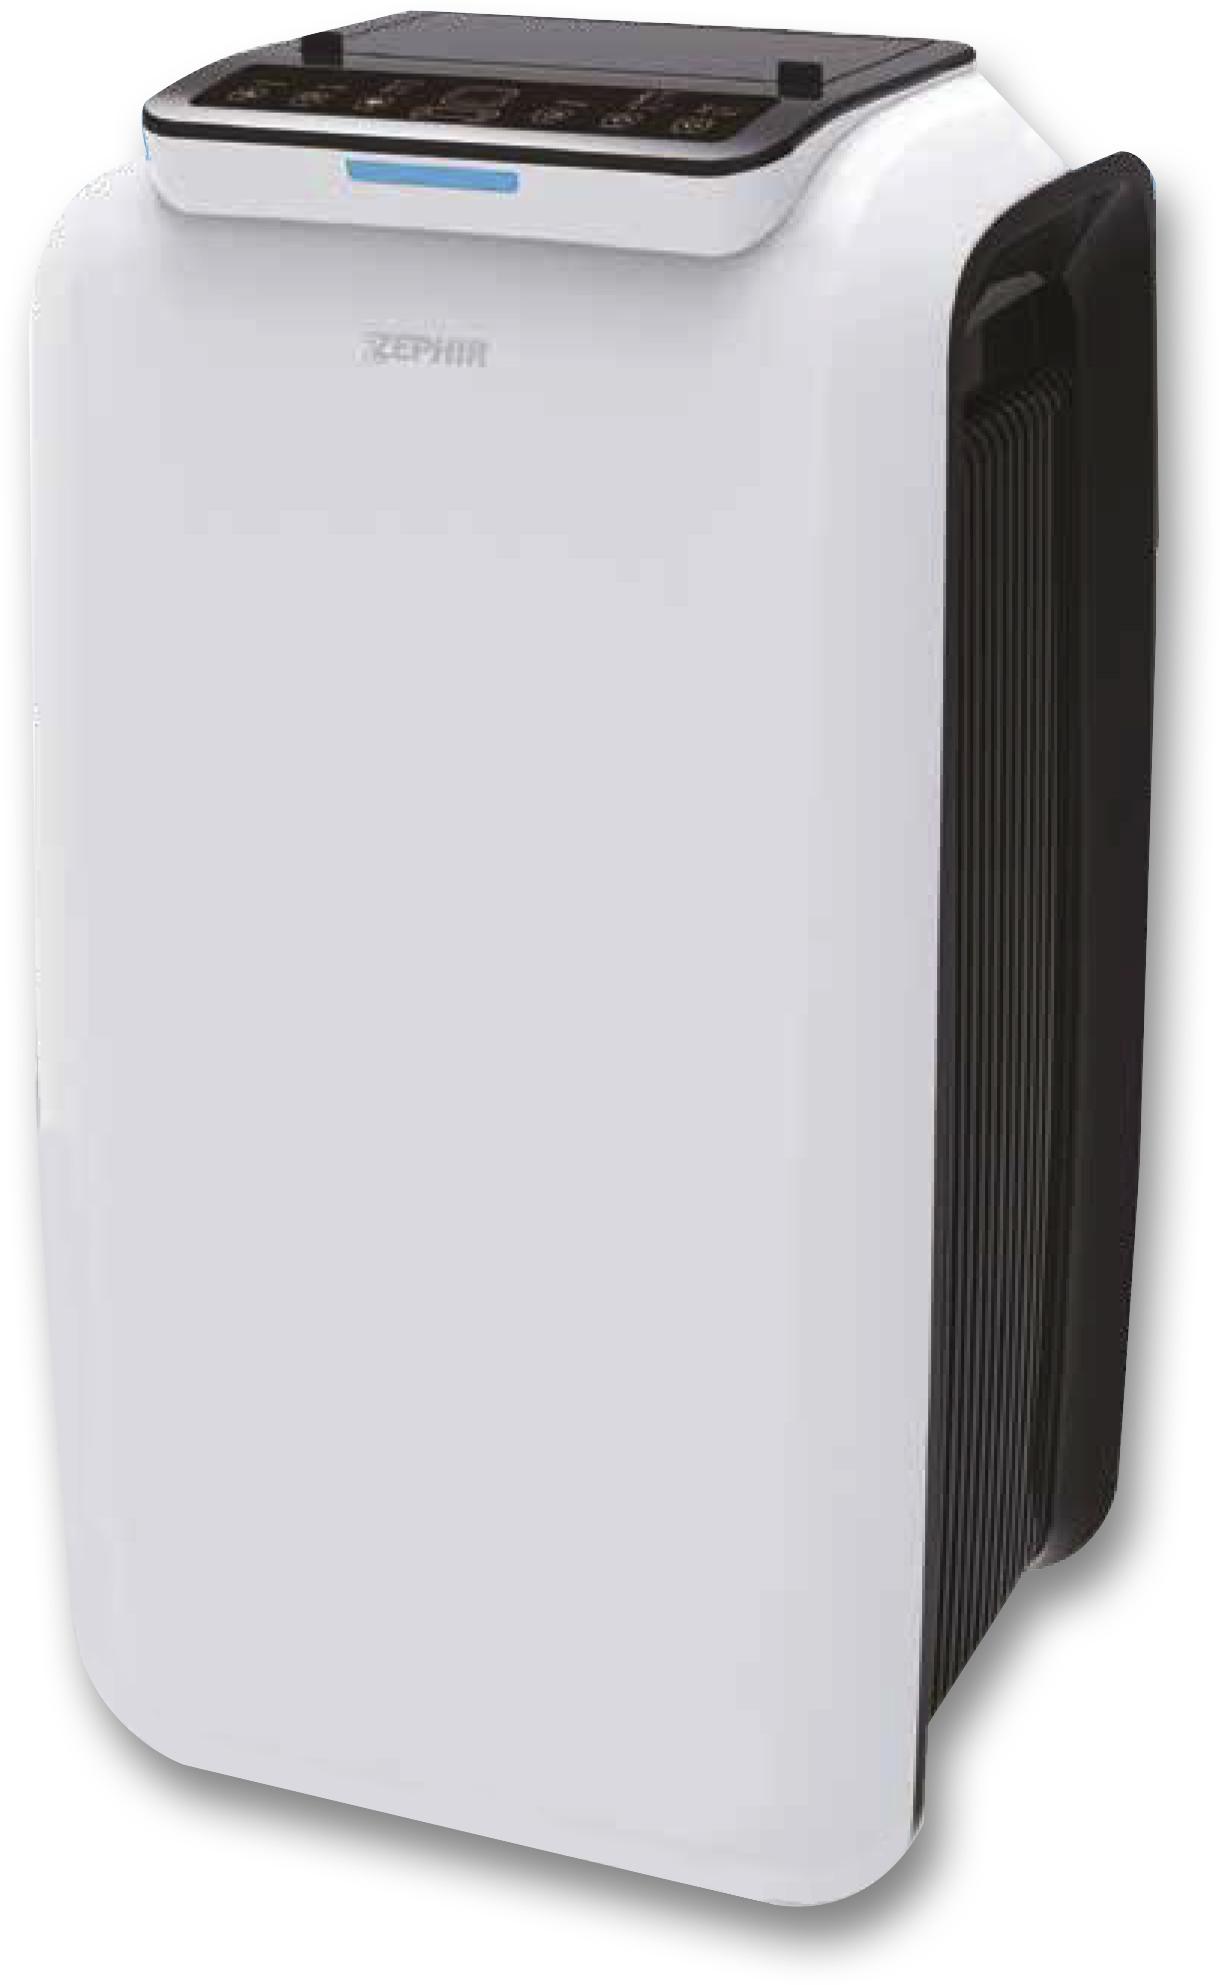 Zephir condizionatore portatile 9000 btu h climatizzatore for Condizionatore portatile clatronic